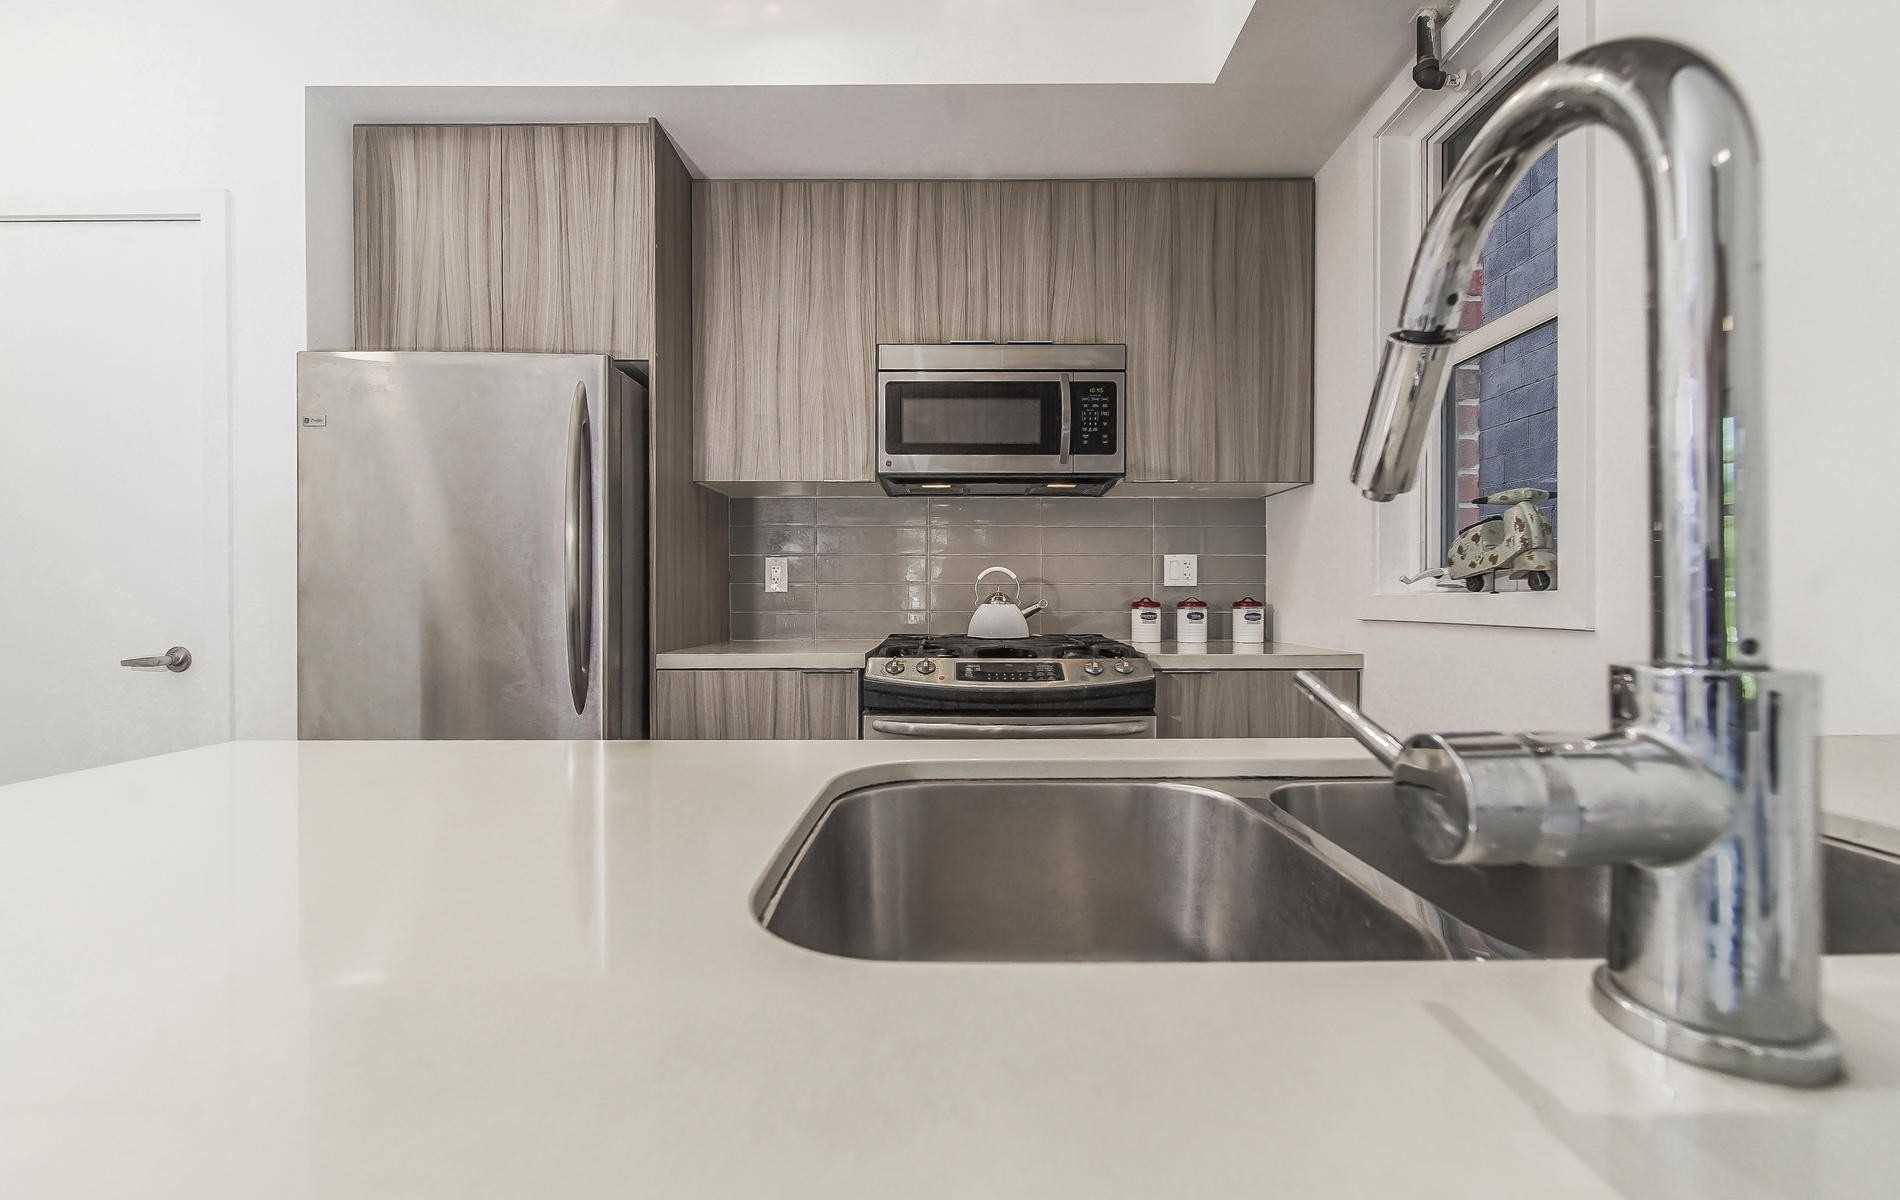 Photo 6: Photos: Th 11 150 Broadview Avenue in Toronto: South Riverdale Condo for sale (Toronto E01)  : MLS®# E4519038